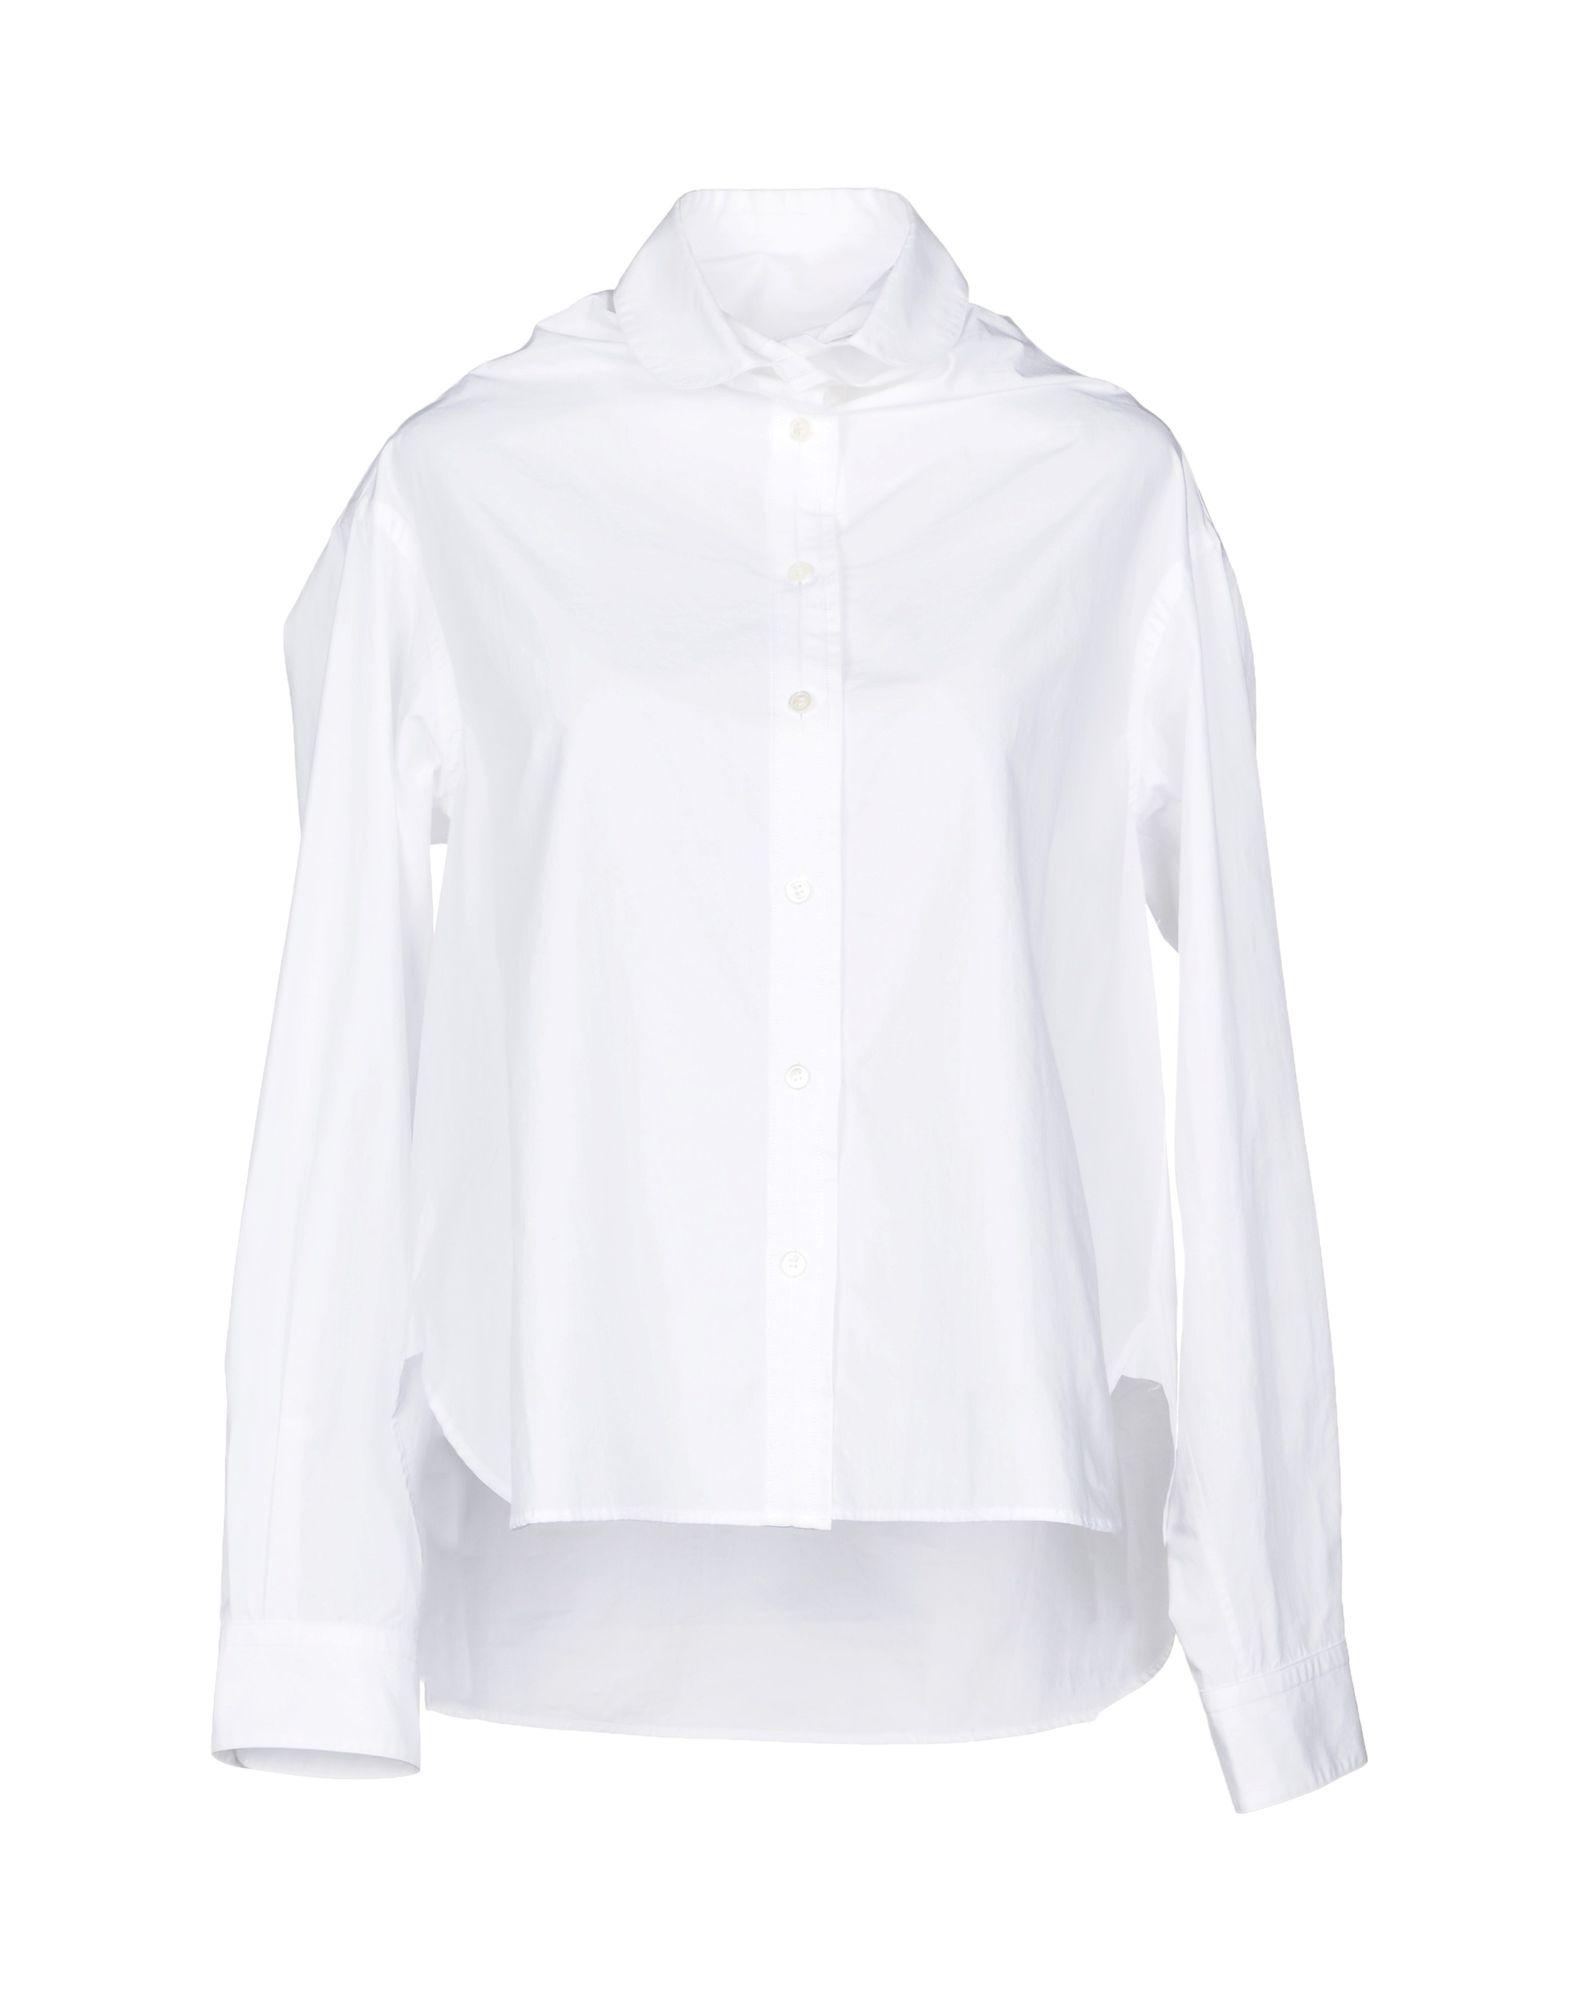 SAKAYORI. Solid Color Shirts & Blouses in White